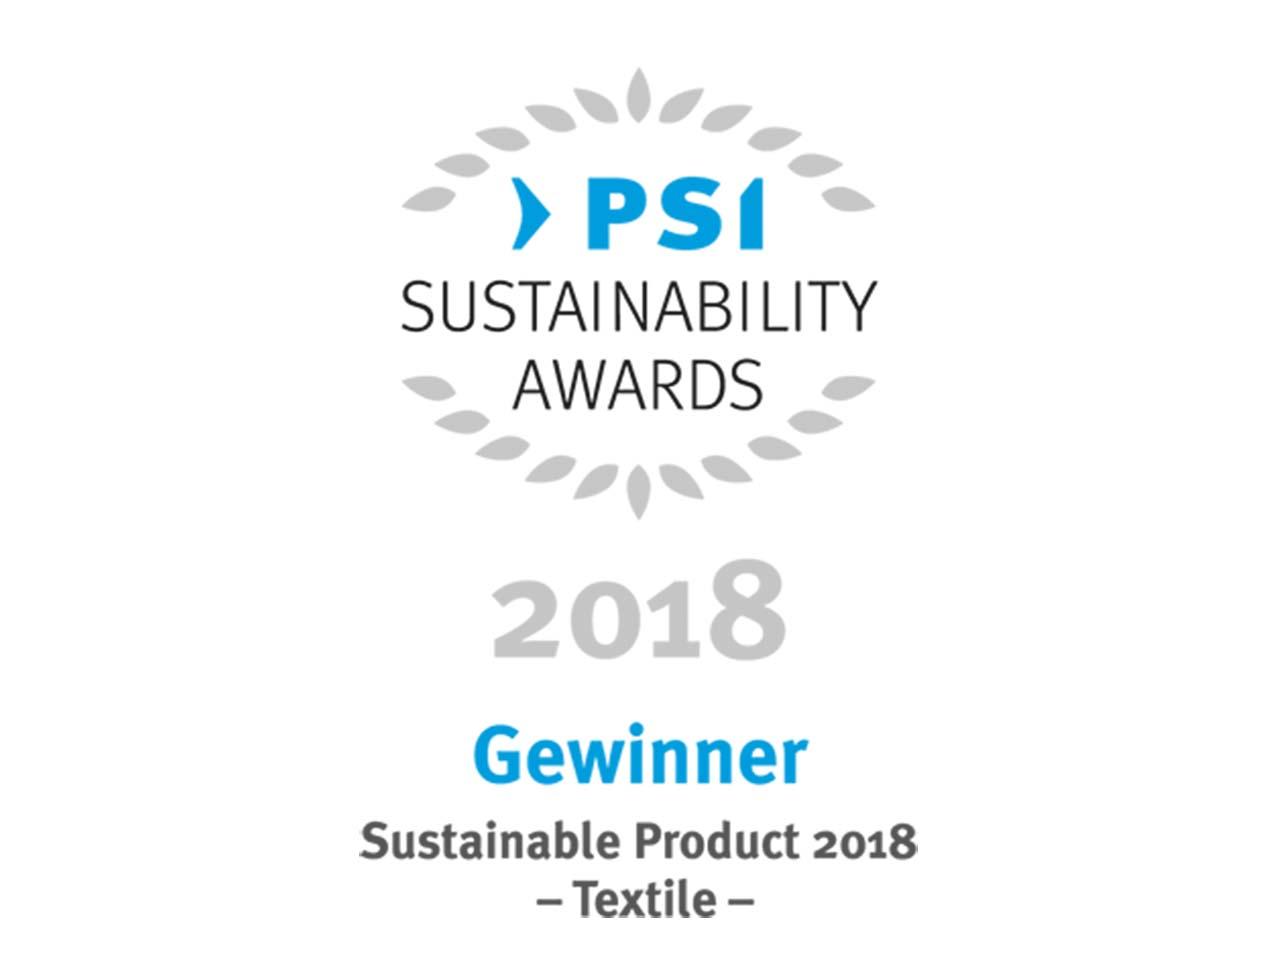 V2221_PSI_sustainability_awards_2018.jpg